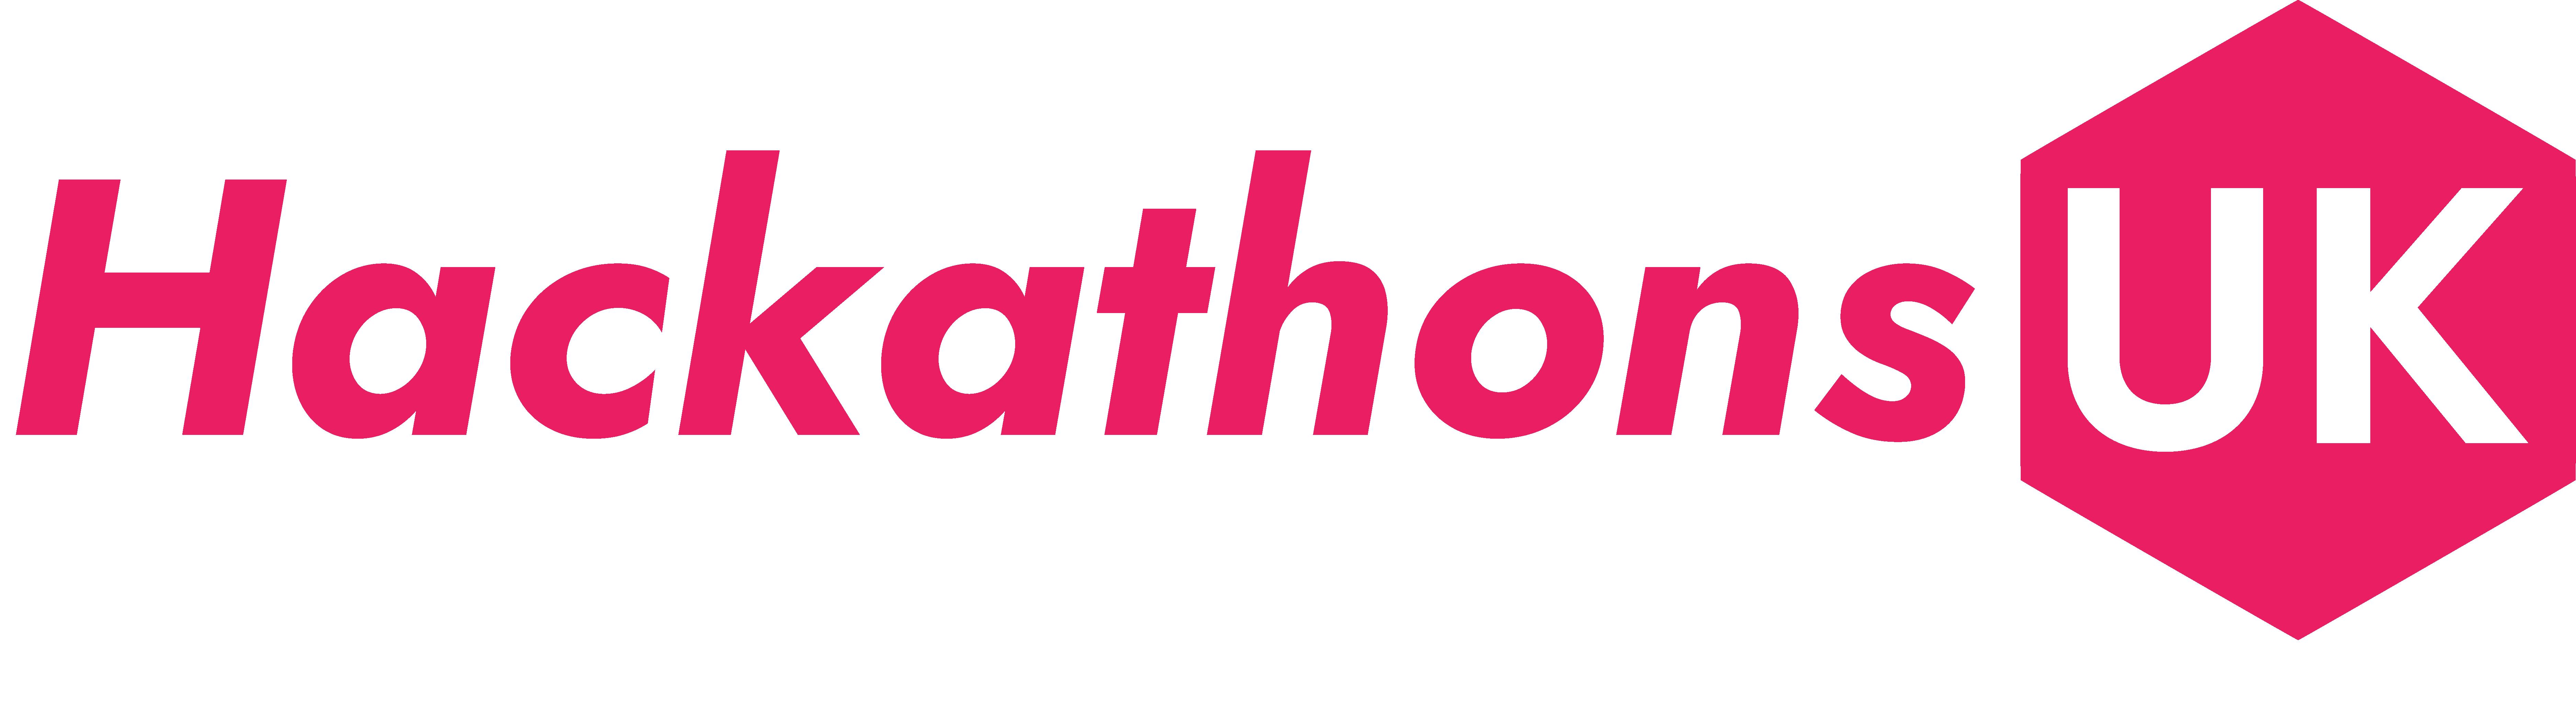 Hackathons.UK